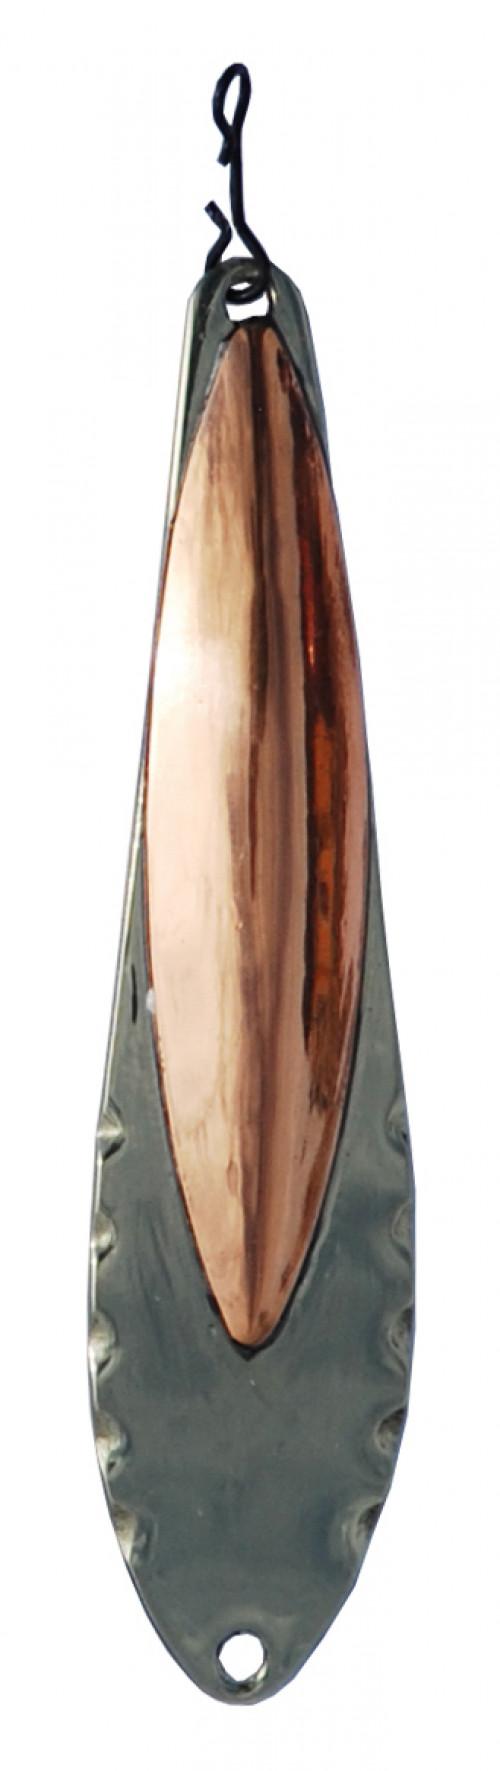 Wiggler Säffle Pirken 70mm 11g